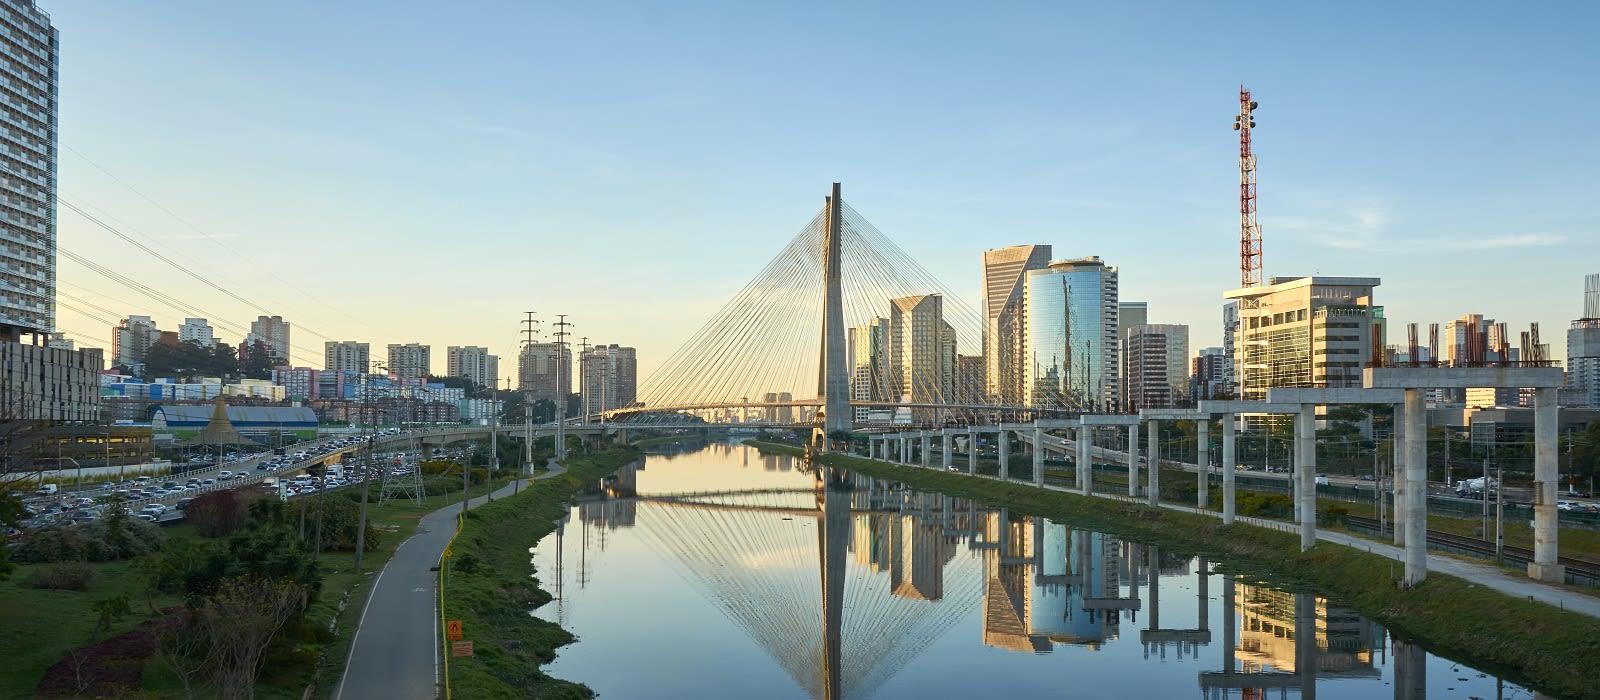 Brazil's Big Cities, Nature and Beach Tour Trip 1